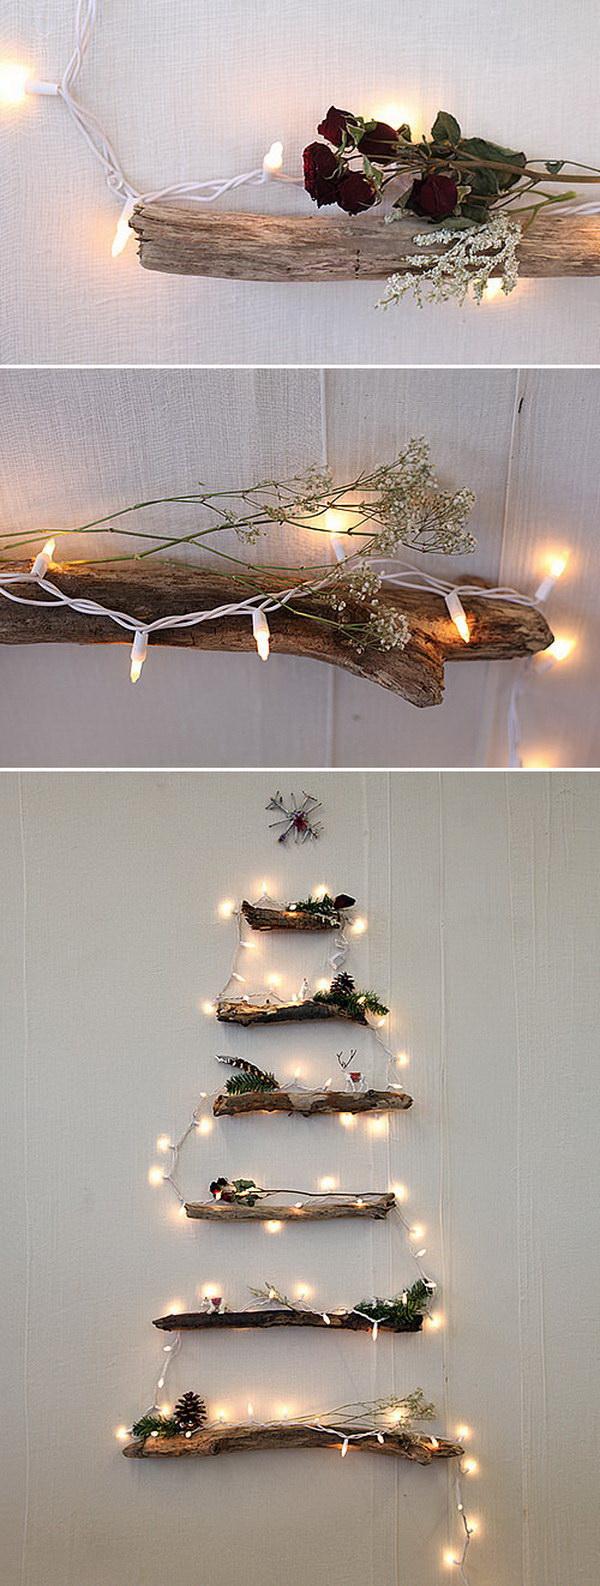 DIY Lighted Twig Christmas Tree. This DIY lighted twig Christmas tree adds a rustic touch to your holiday decor!